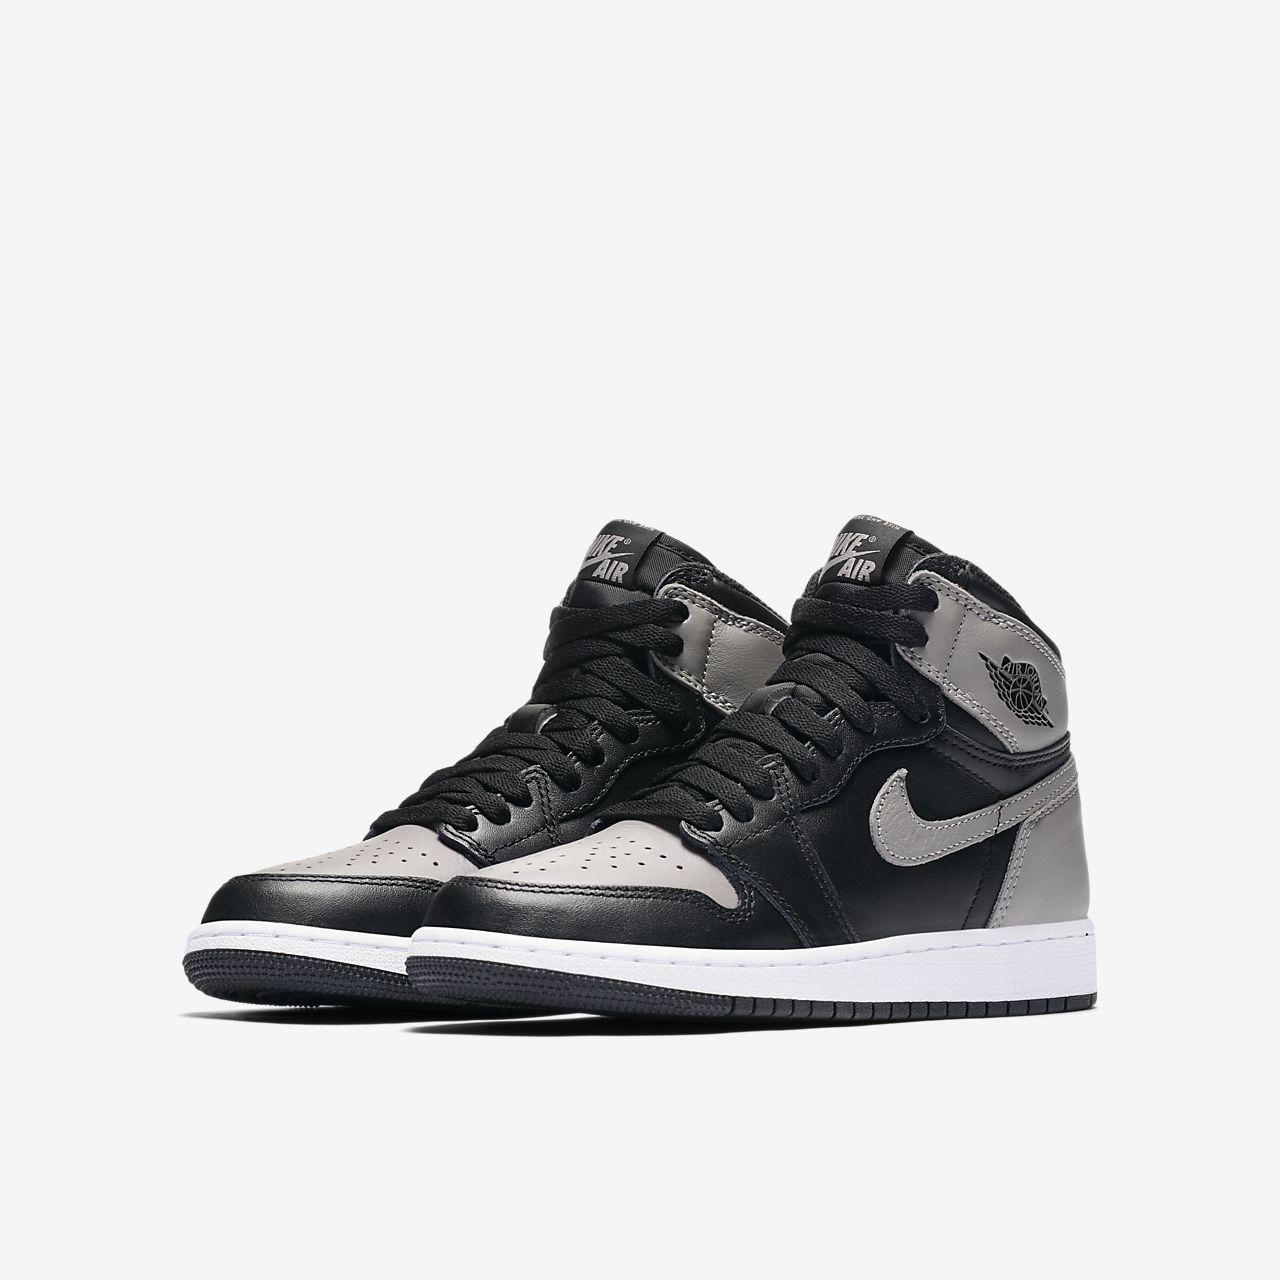 ... Air Jordan 1 Retro High OG Older Kids' Shoe